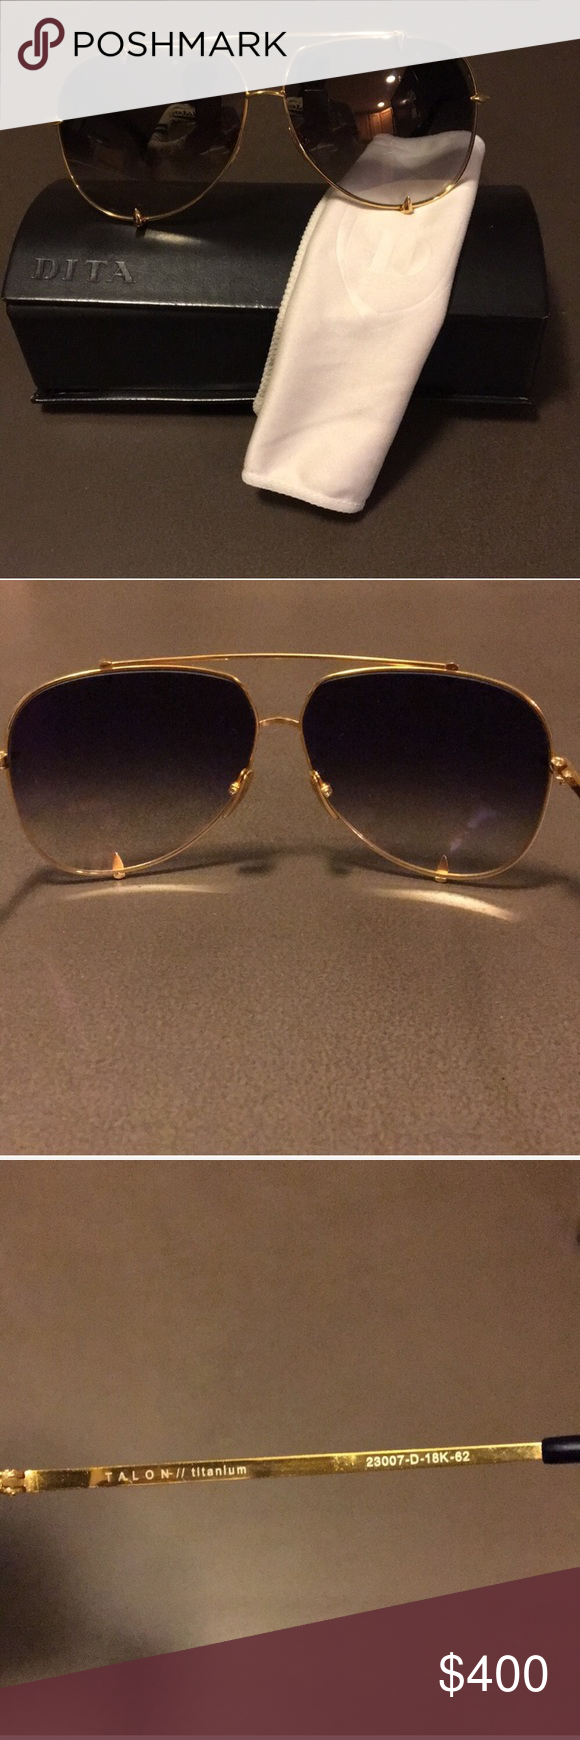 0d2b1e95a15e 18k Gold · Lenses · Sunglasses Accessories · Lentils · NWOT 18kGold  Black  titanium DITA Talon aviators NWOT Black  amp  18kGold DITA TALON aviator